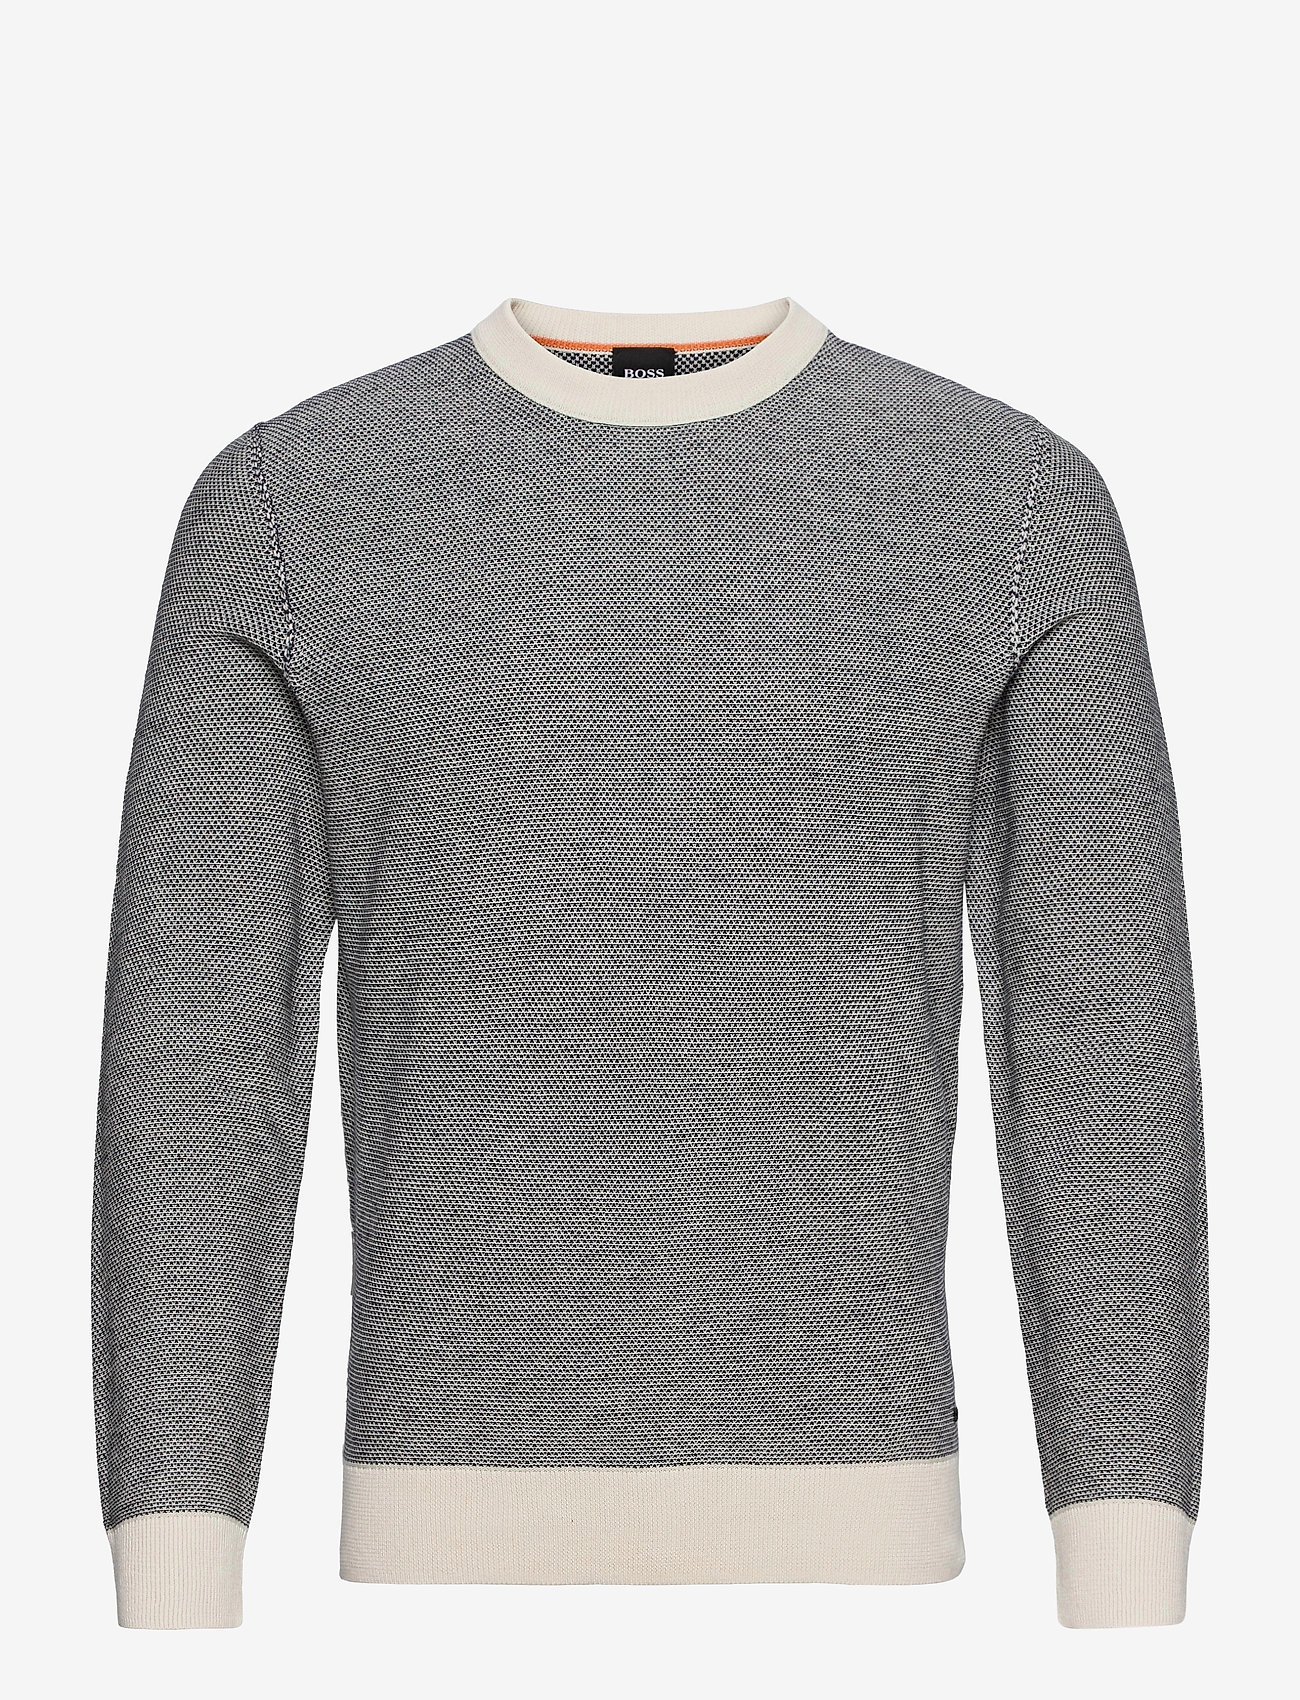 BOSS - Kamarsos - tricots basiques - light beige - 0